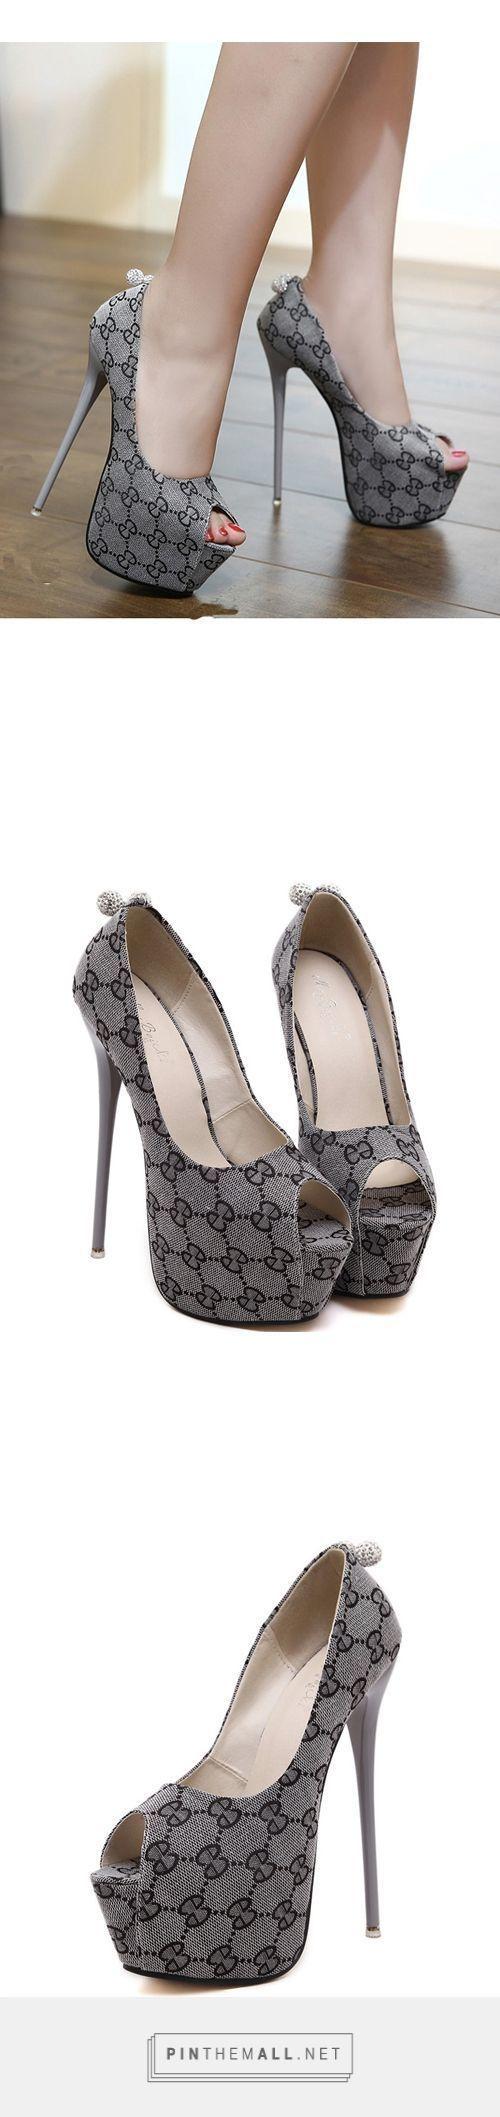 Exquisite sexy platform high slim heel peep toe pumps #shoeshighheelsfashion #platformhighheelsboots